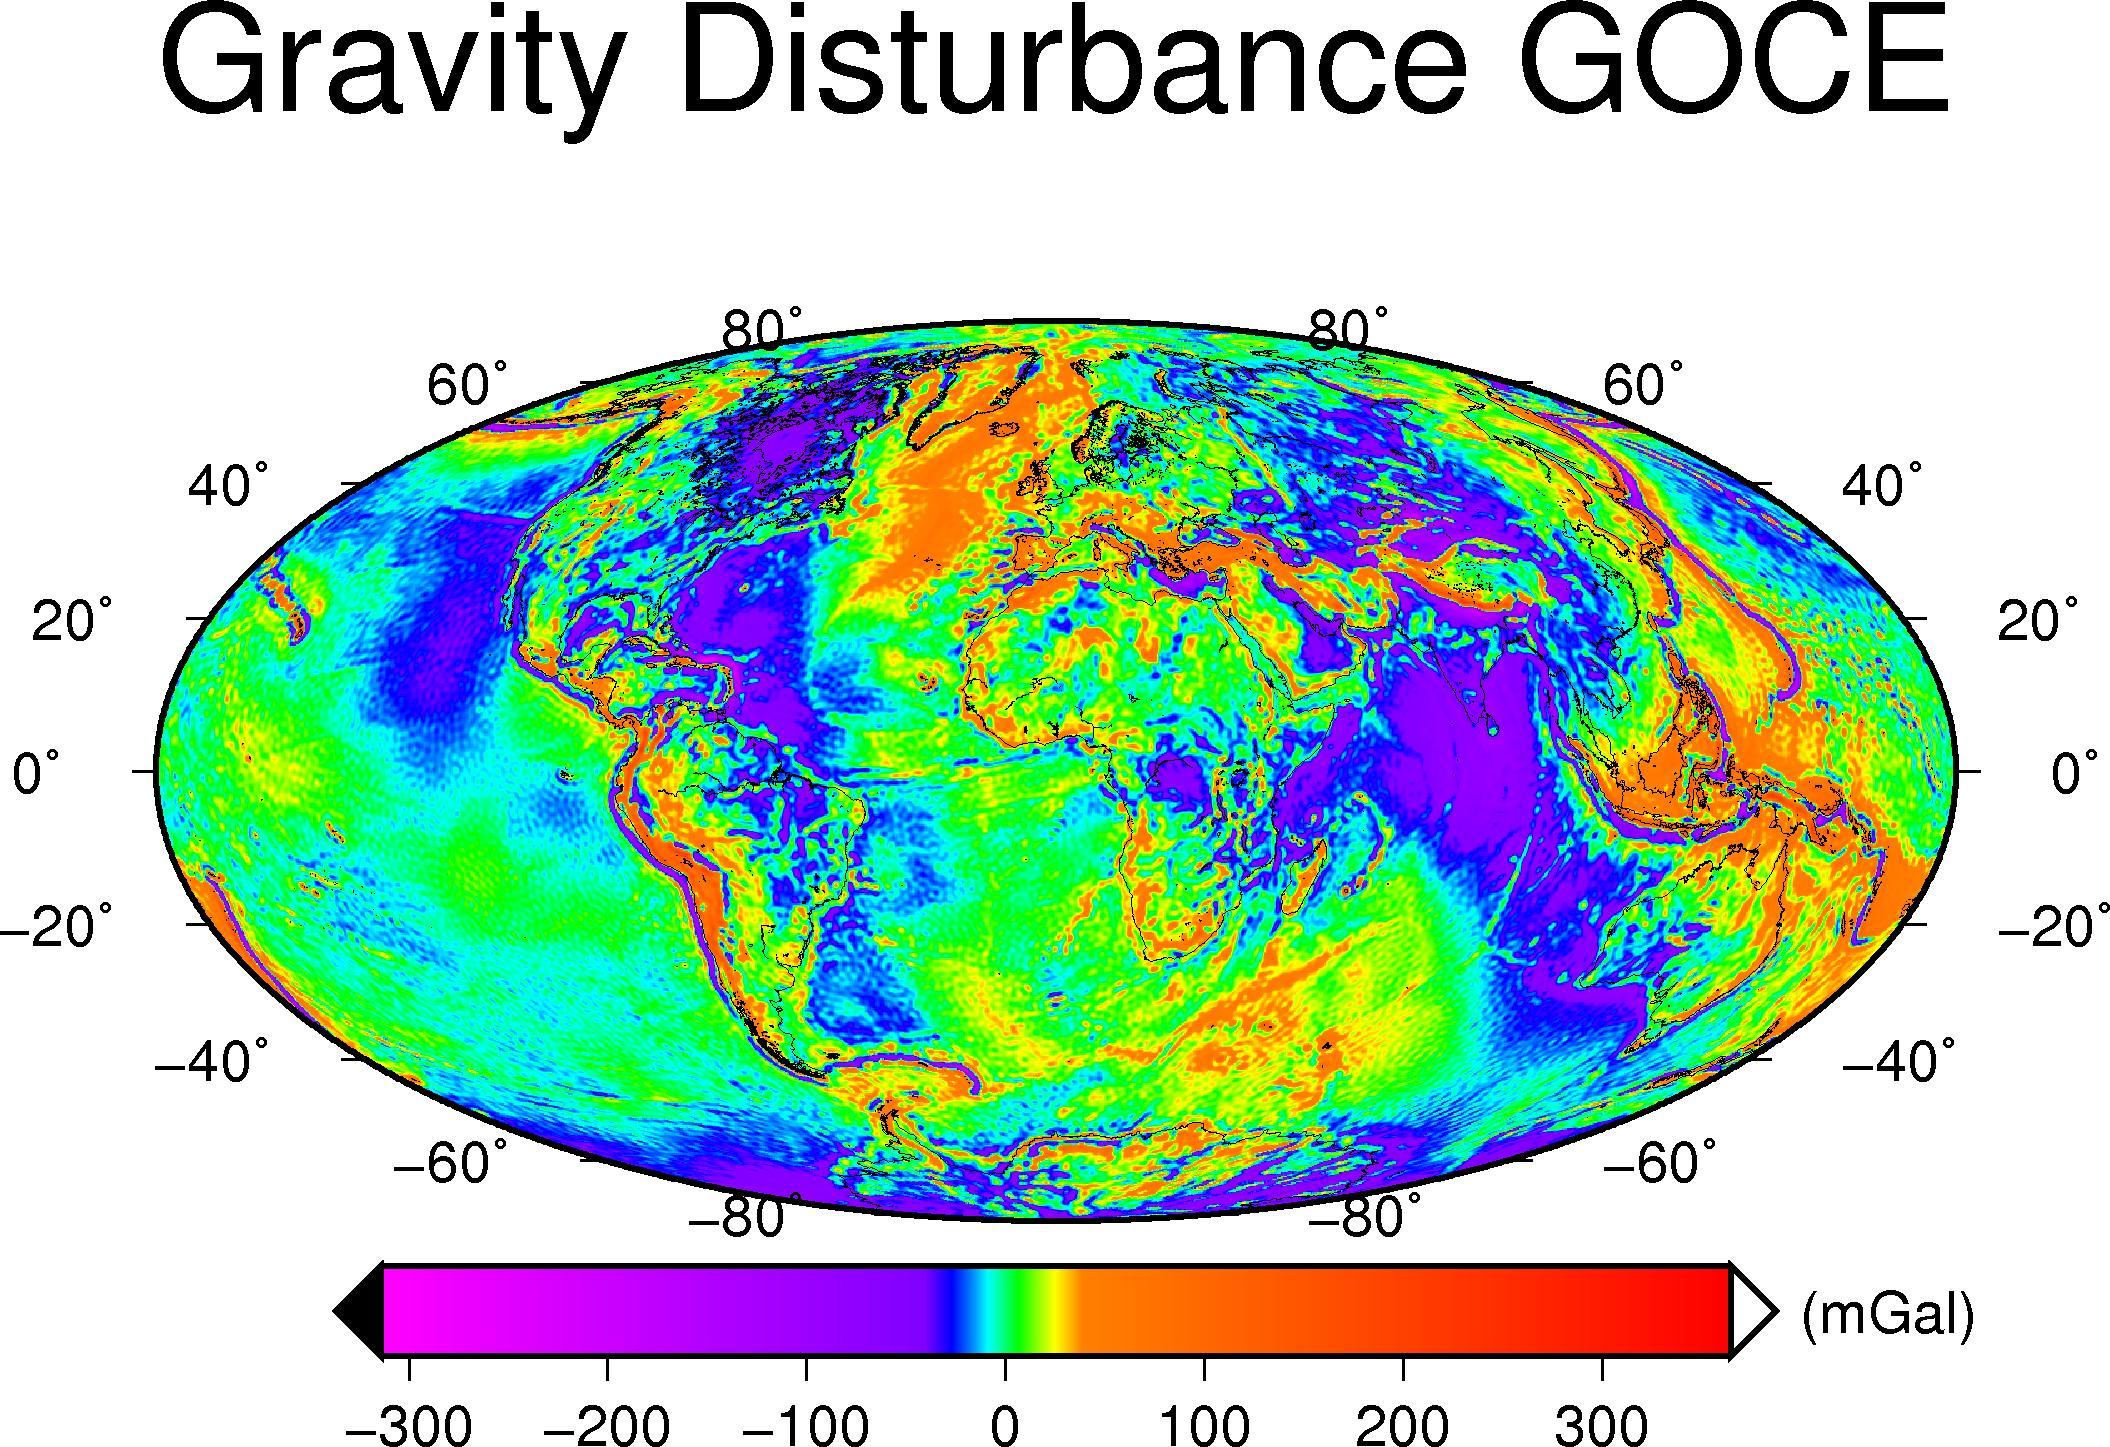 Global_Grav_Disturbance_N250_ESAPress.JP